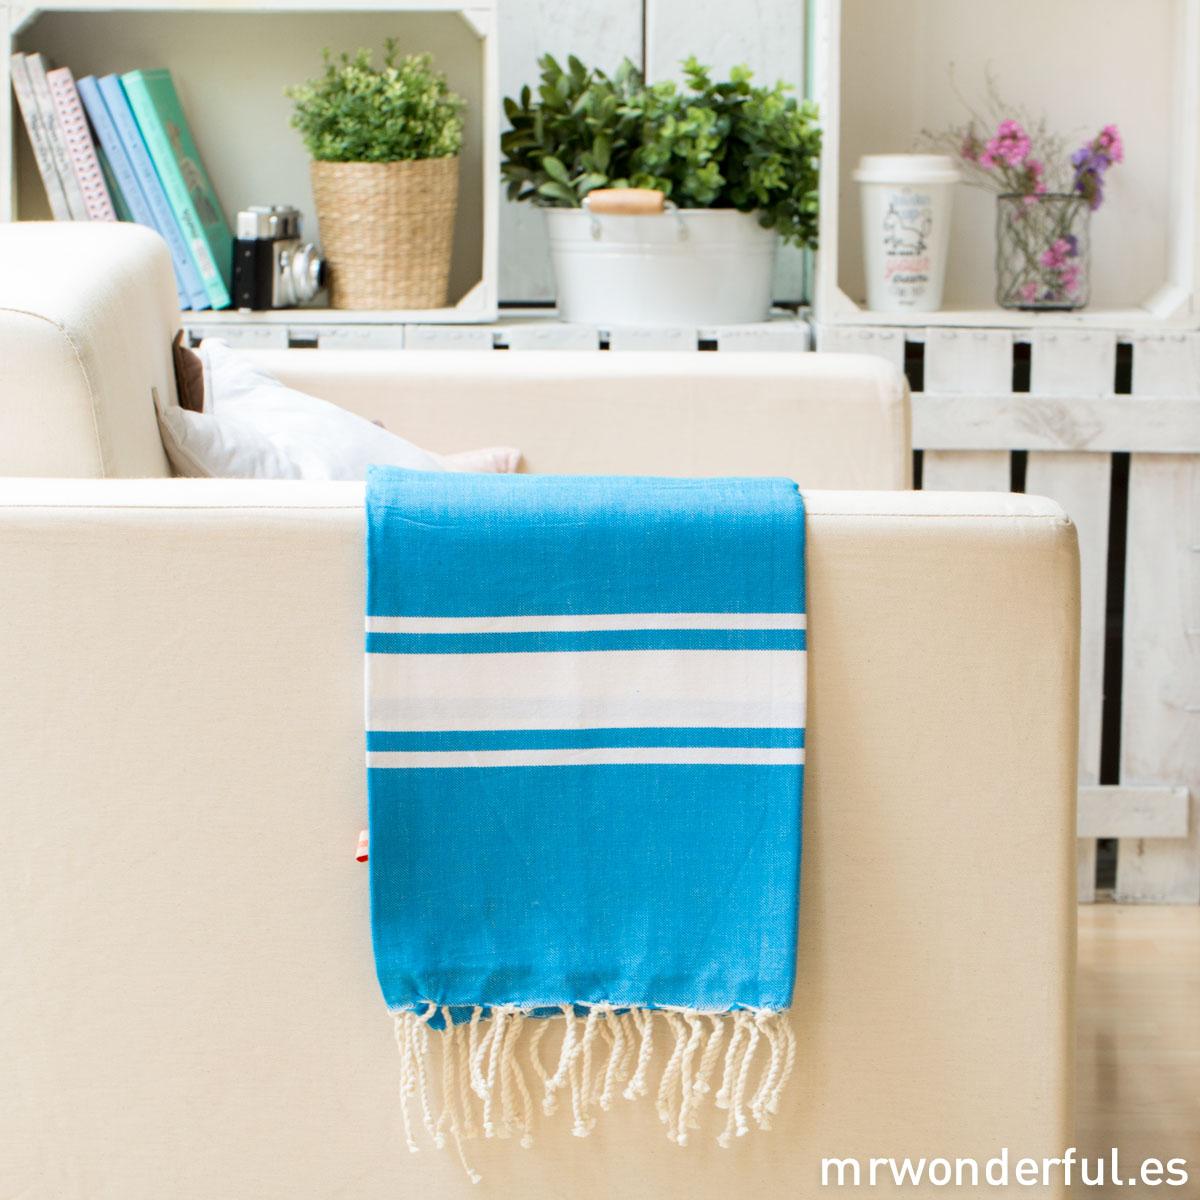 mrwonderful_turquoise_plaid-turquesa-2